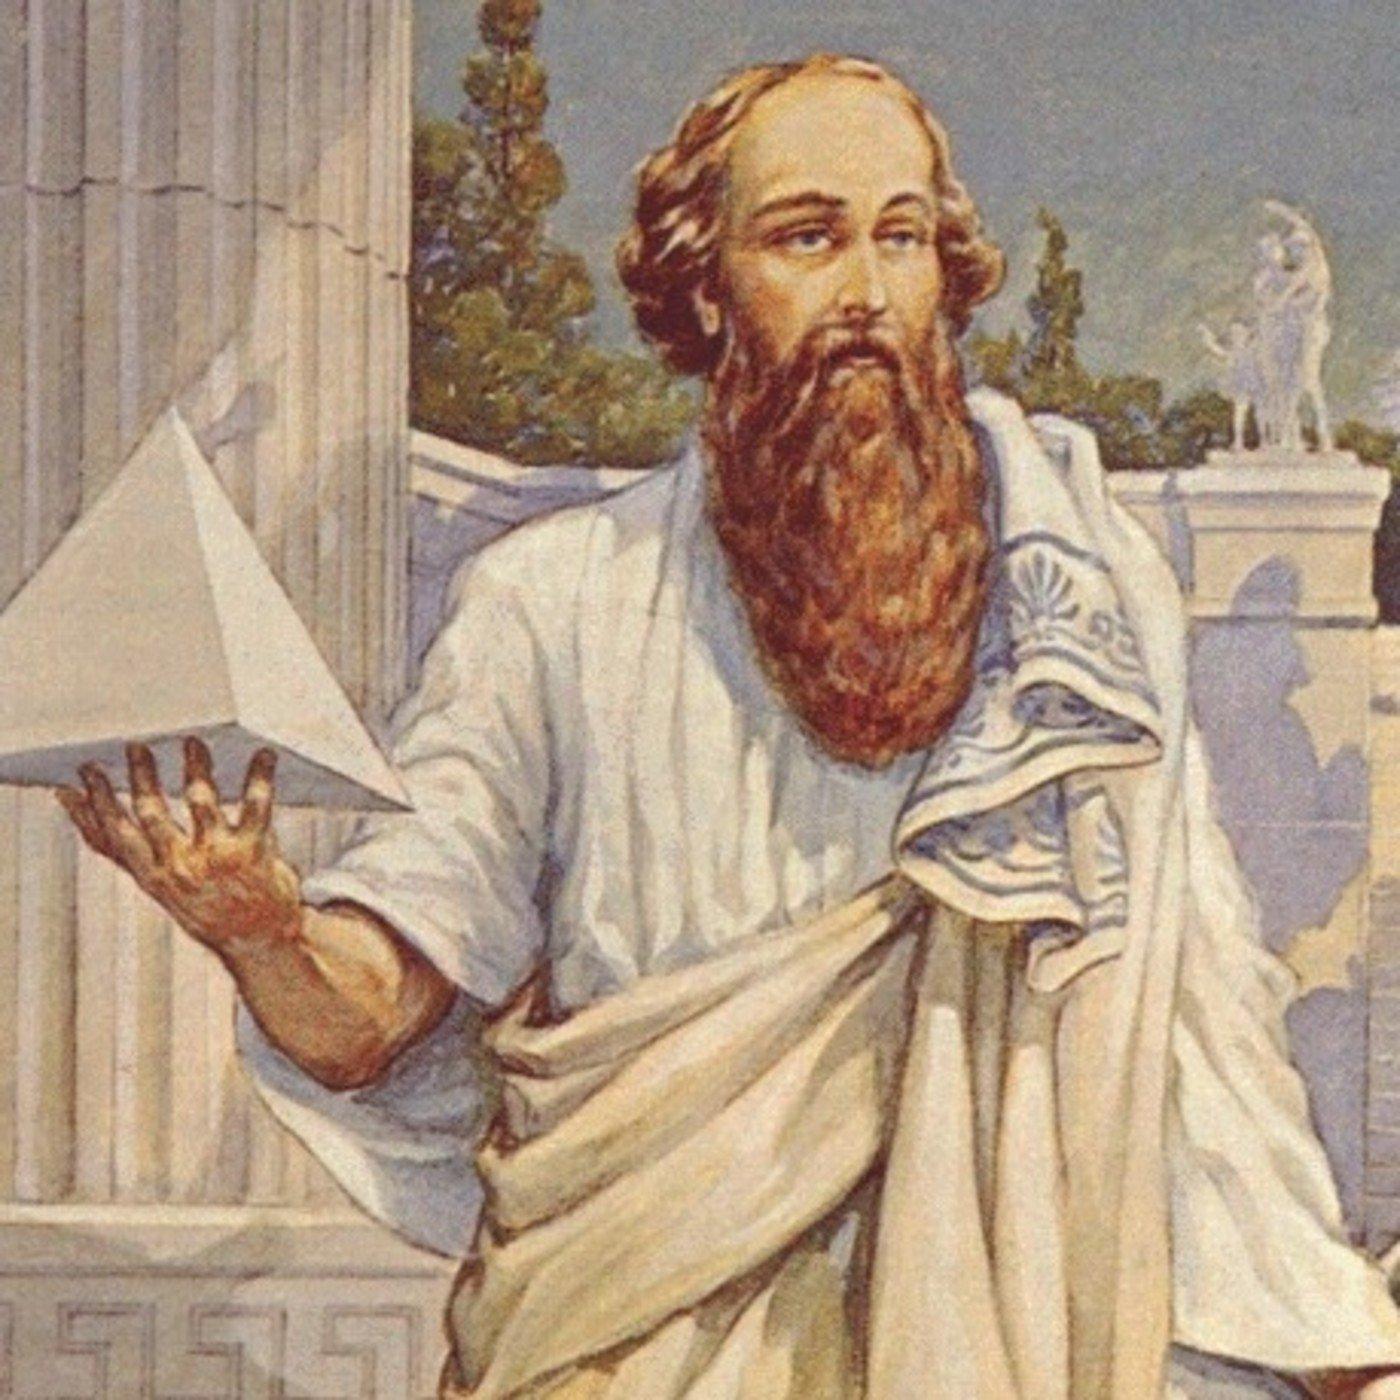 historia del teorema de pitagoras